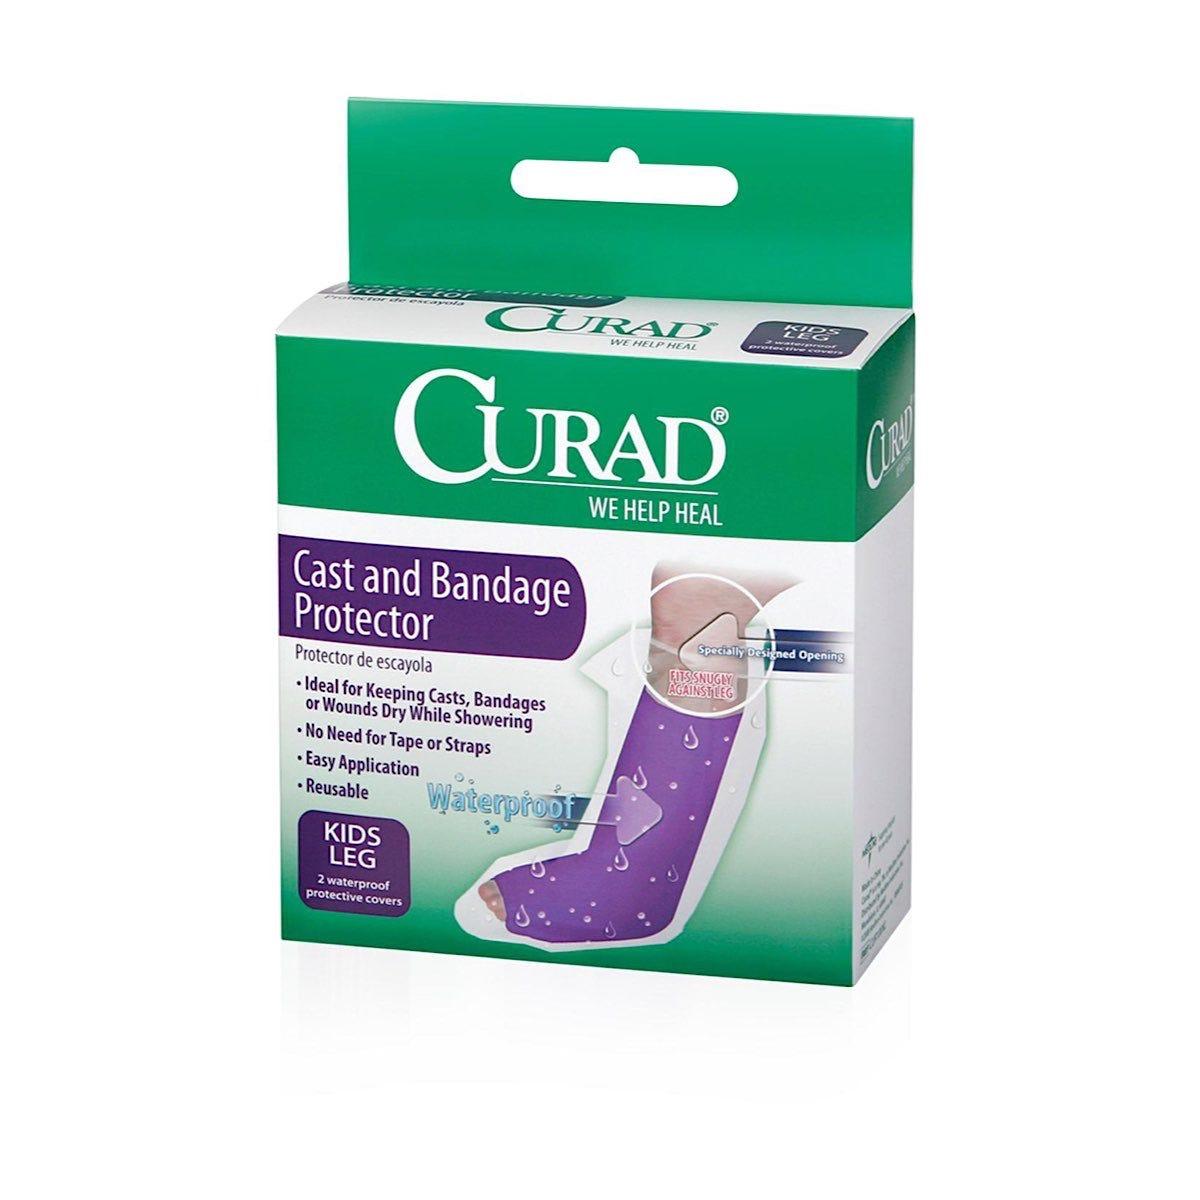 Curad Leg Protector Cast and Bandage Protector, Child, 2/box